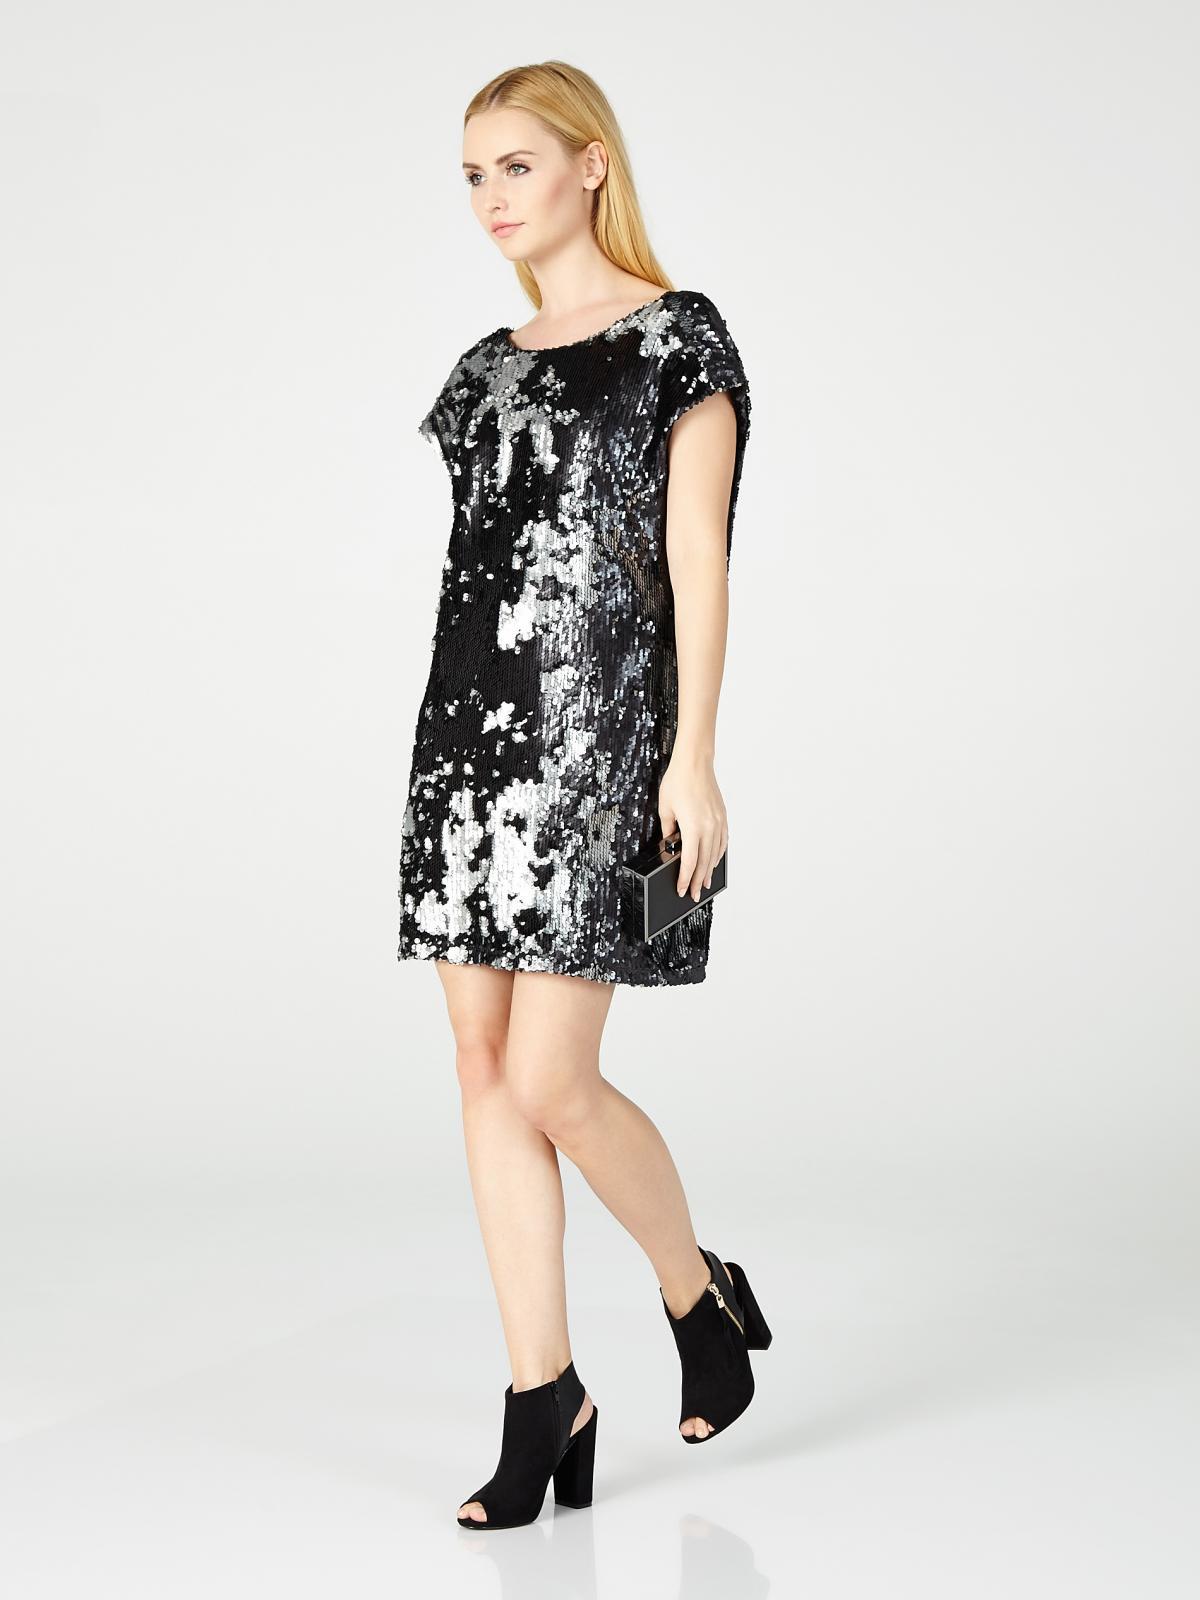 d8752c775f Czarna Sukienka Mohito Z Cekinami Cekinowe Sukienki Trendy